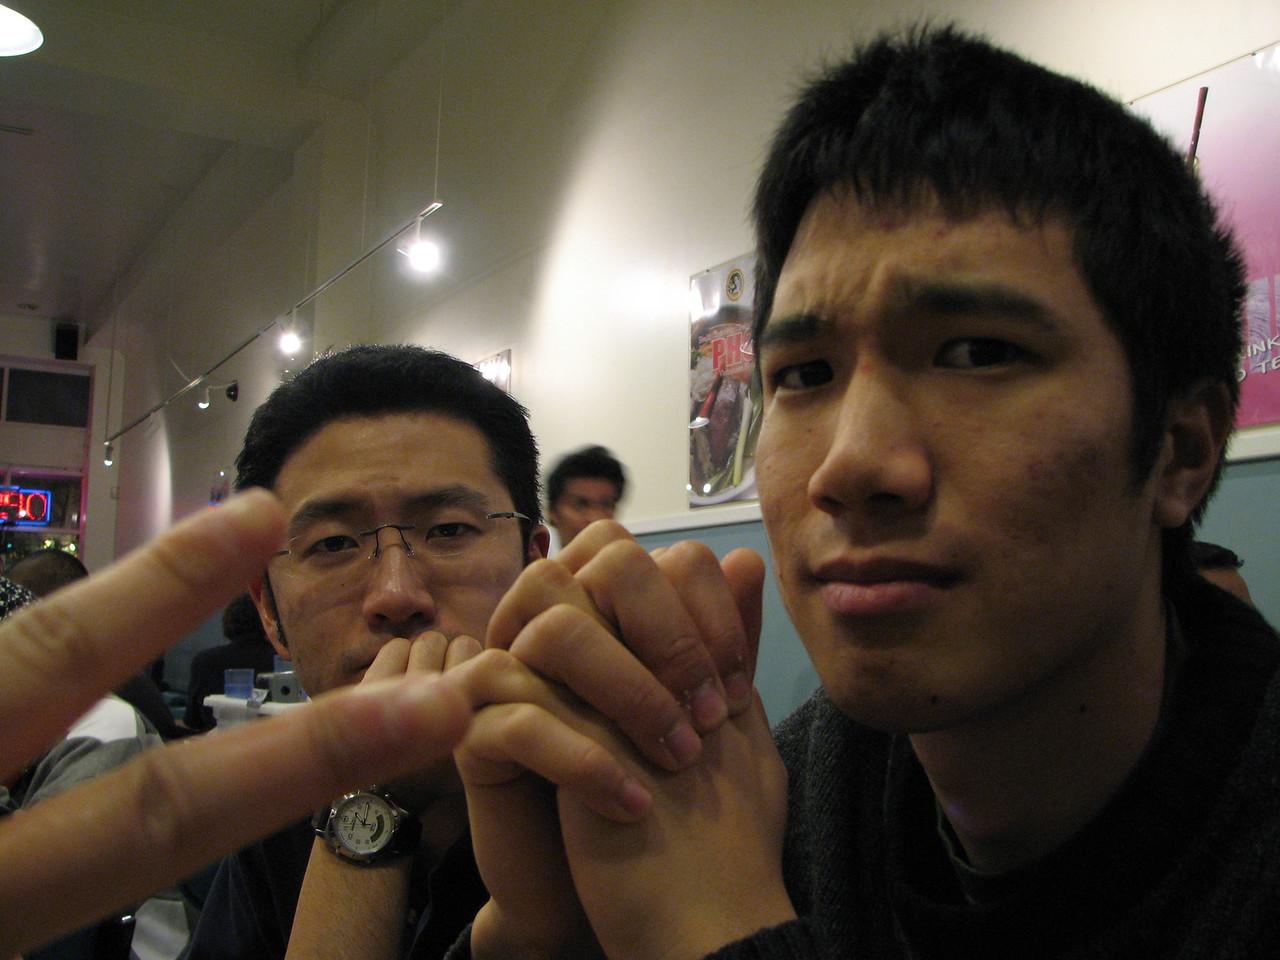 2007 01 28 Sun - Bryan Lung & Michael Lin praying for pho